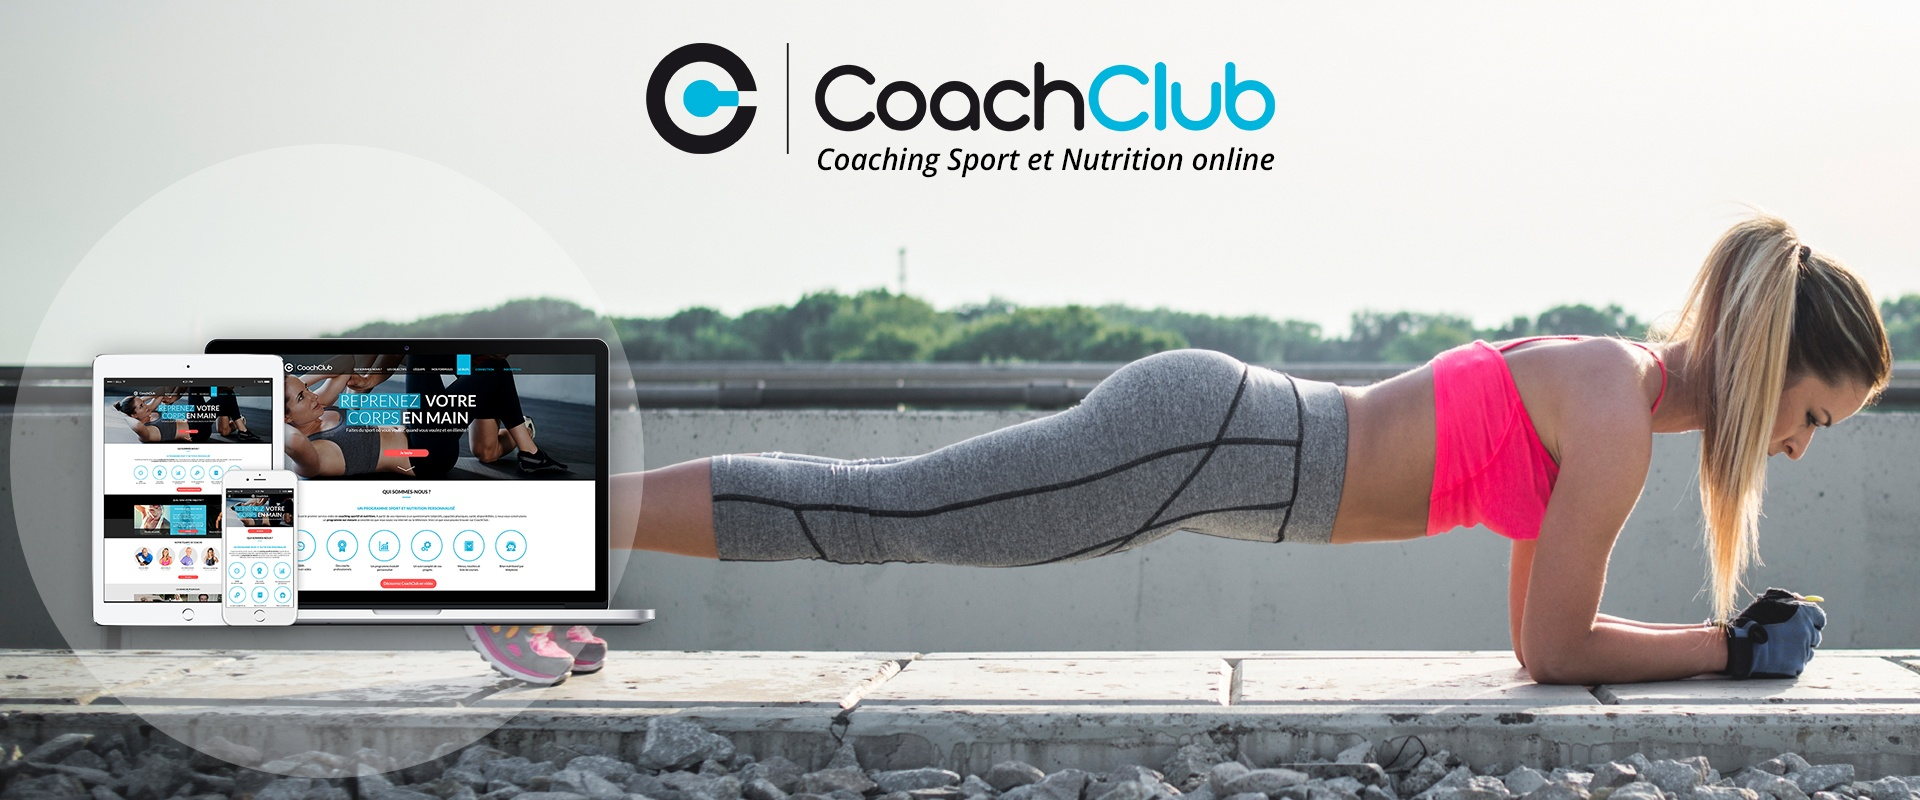 Coachclub : des coachs de renommés disponible en ligne !